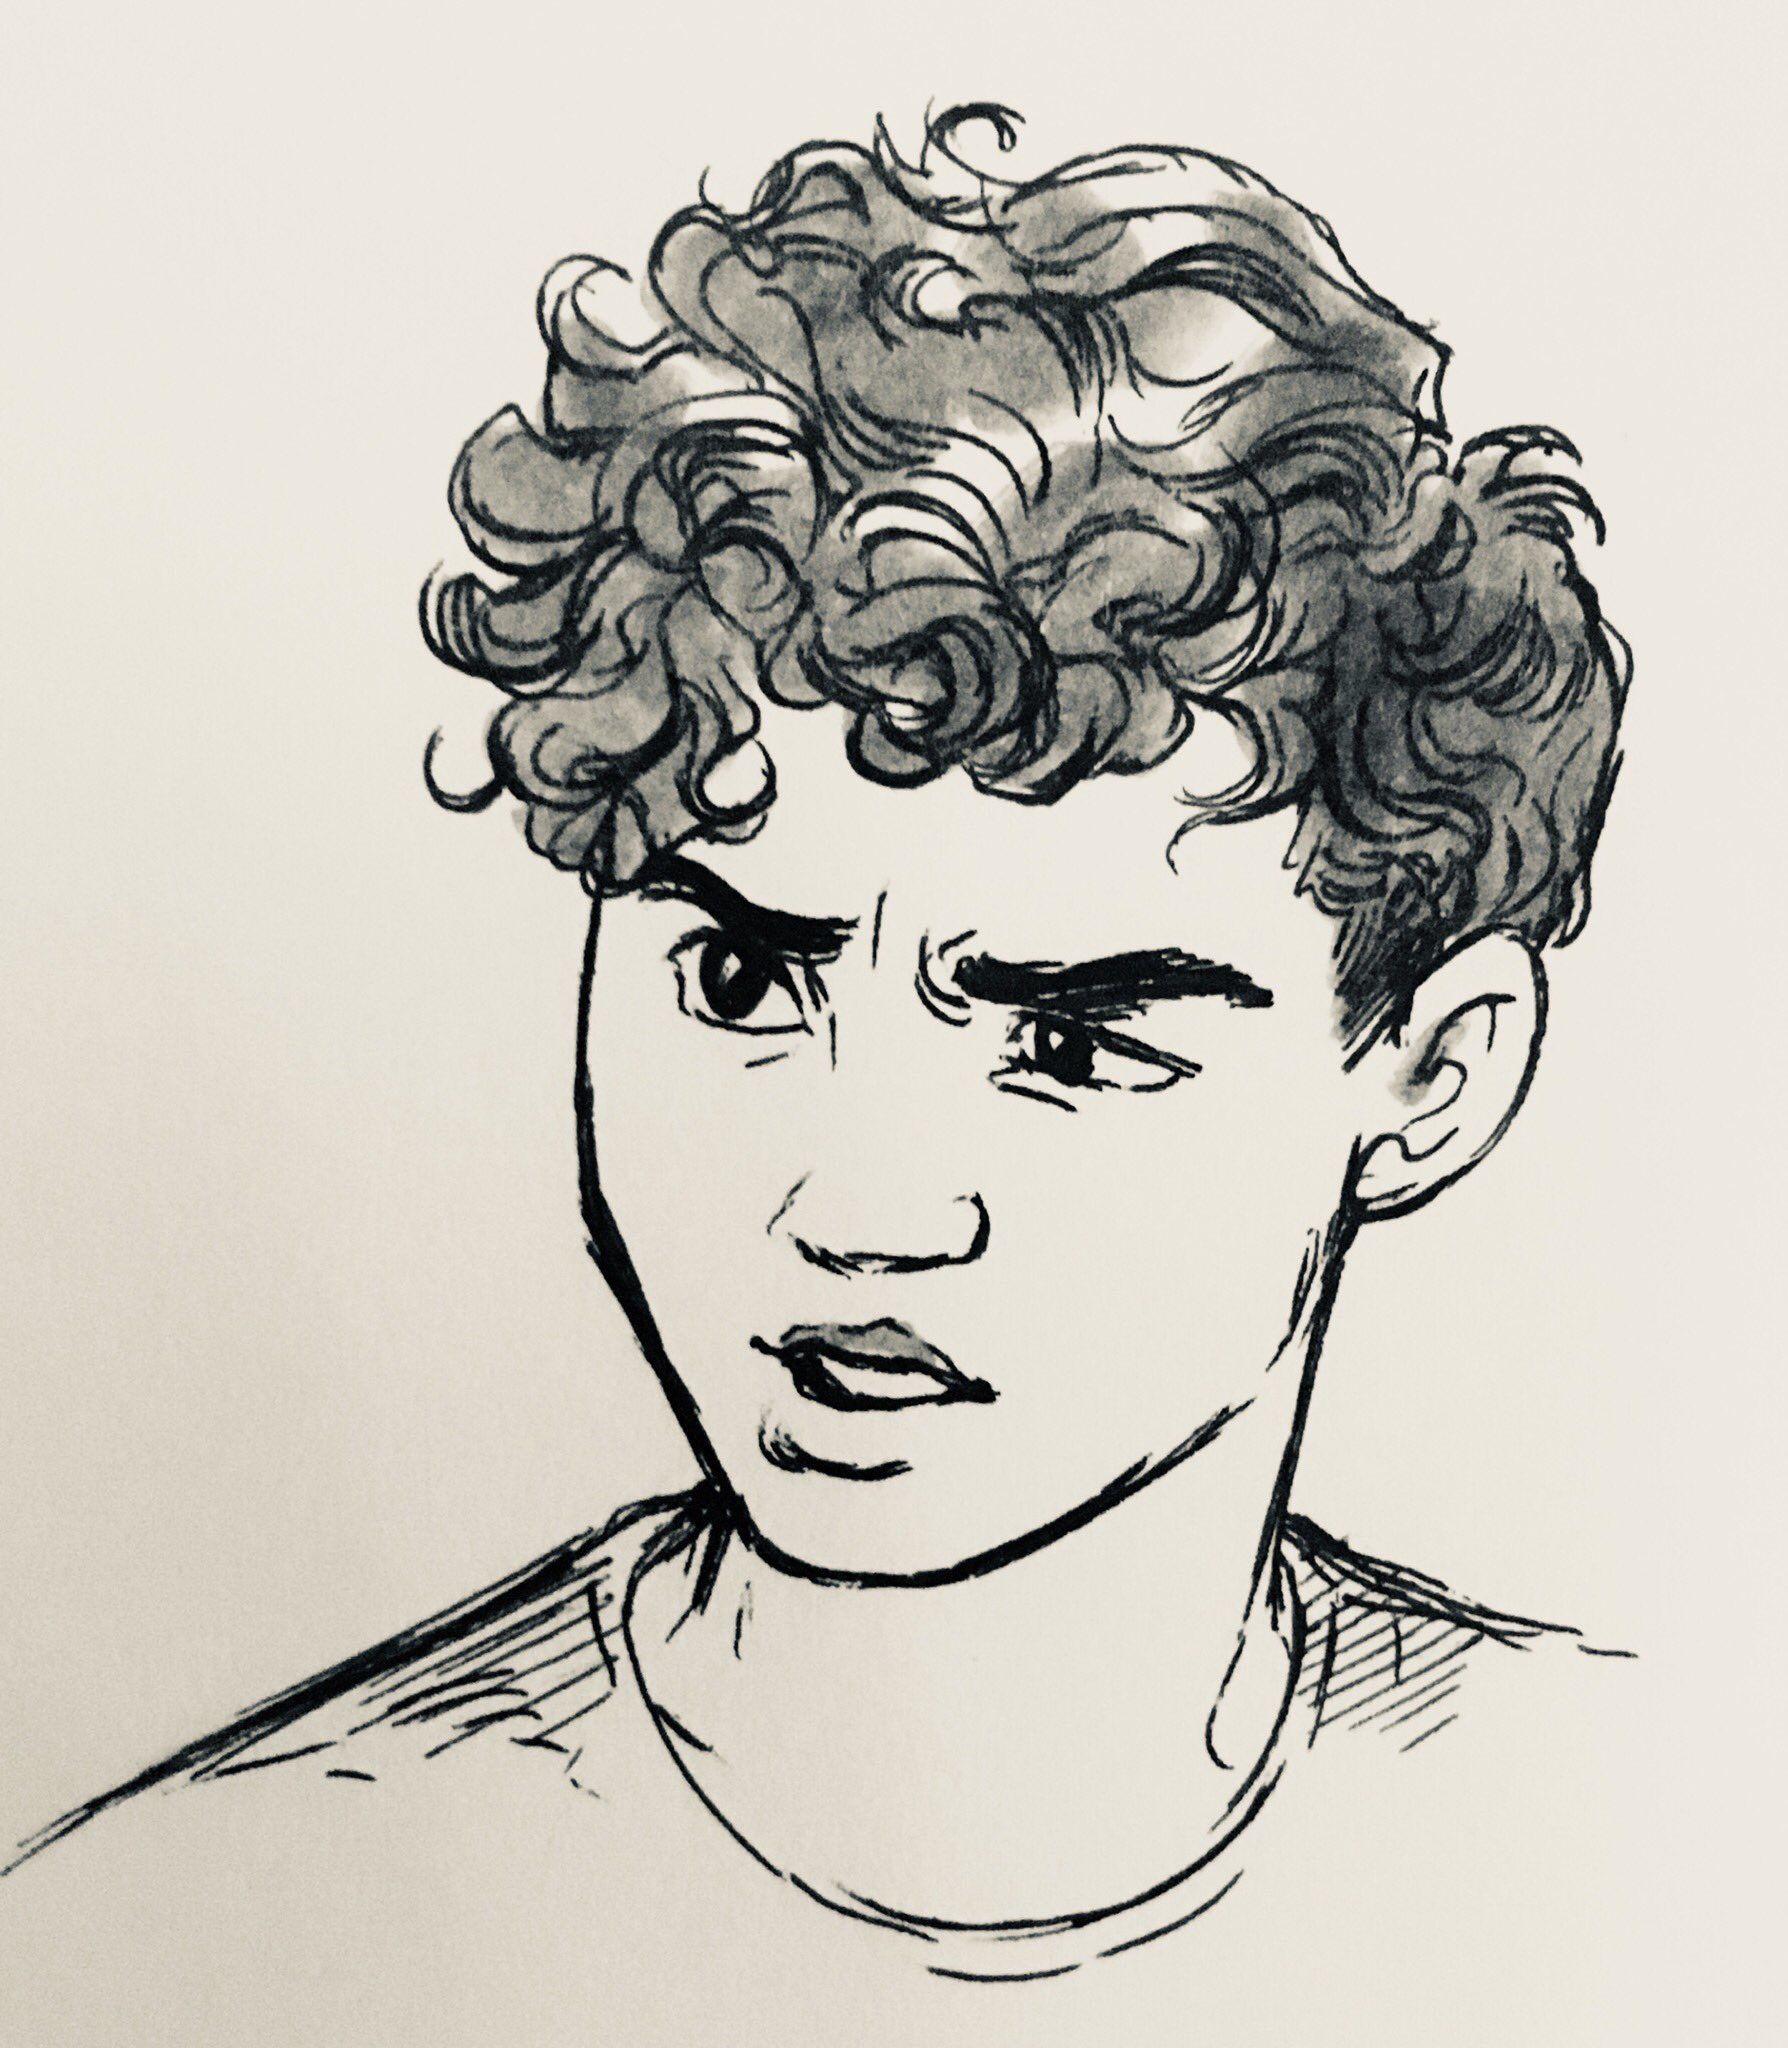 Pin By Alibaba On Ilustraciones Boy Hair Drawing Hair Illustration Boy Cartoon Drawing